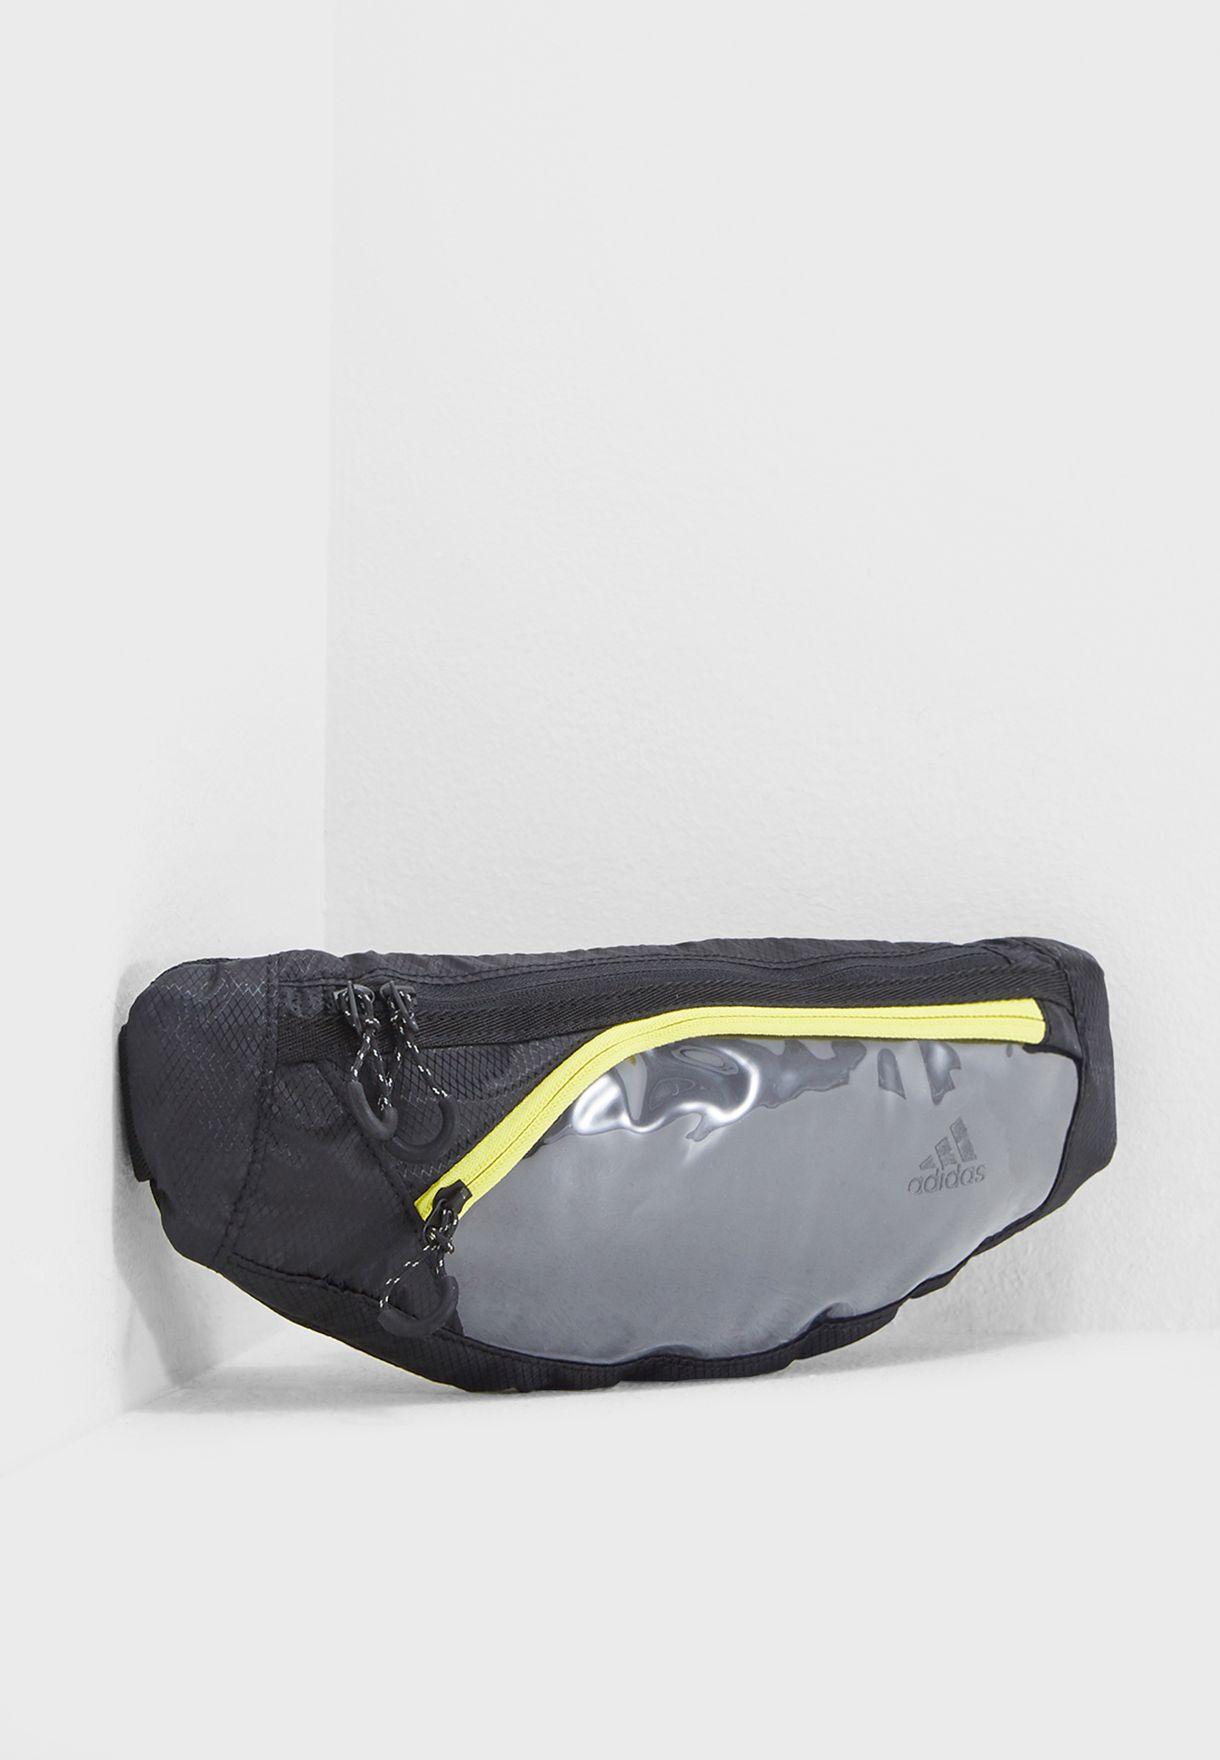 e8af1a151ae4 Shop adidas black Run Waist Bag DM3272 for Men in Saudi - AD476AC64DRR